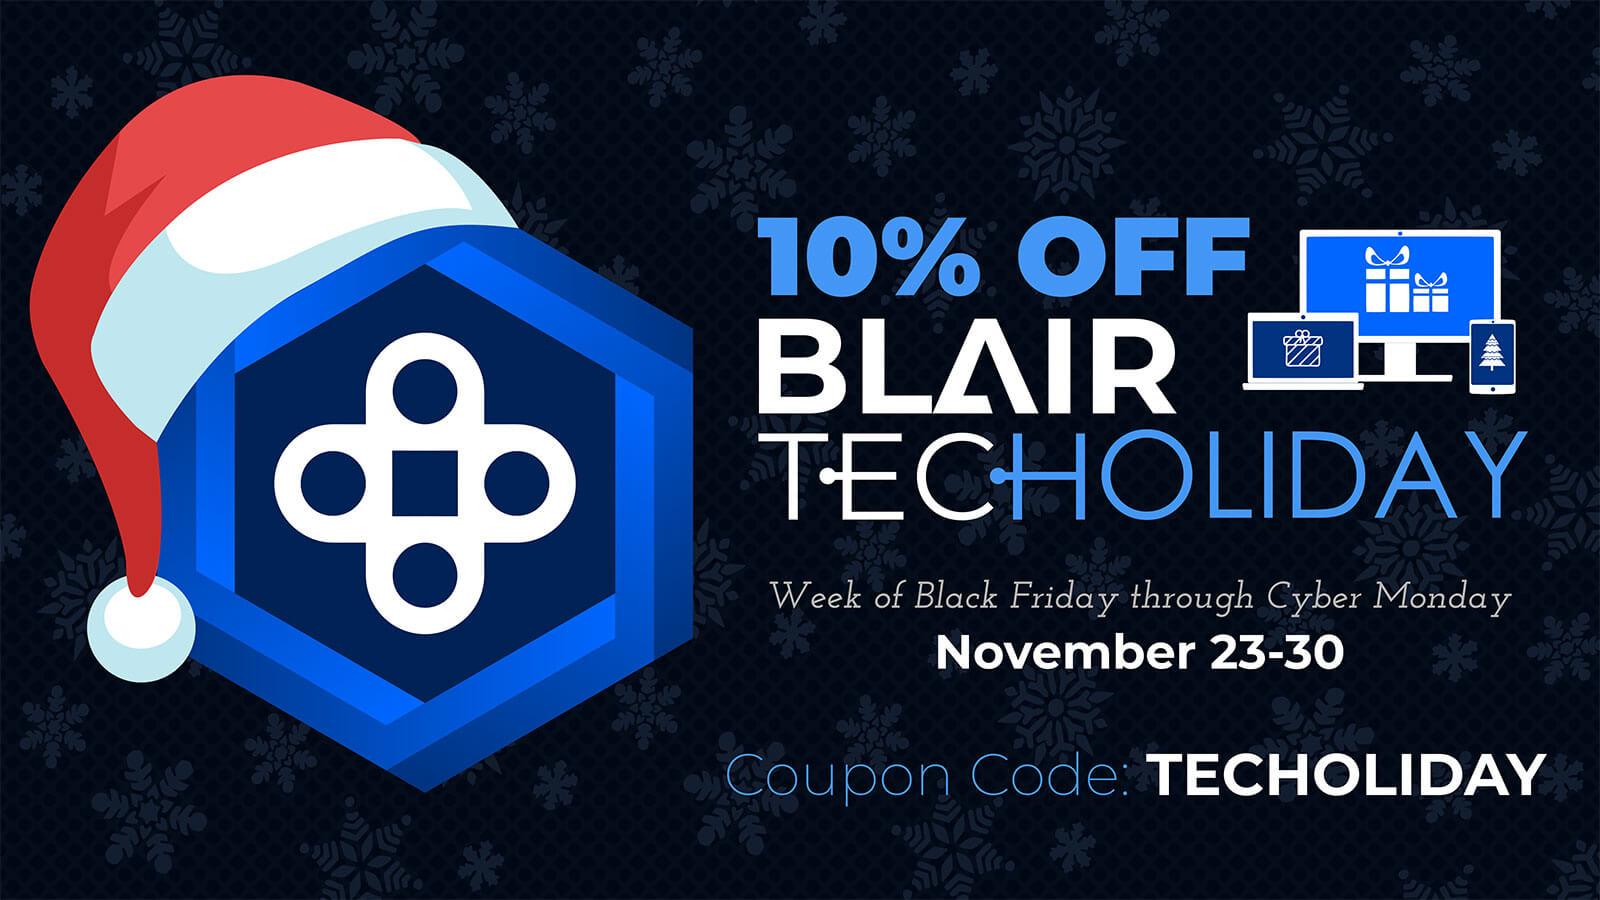 10% Off Blair TecHOLIDAY!